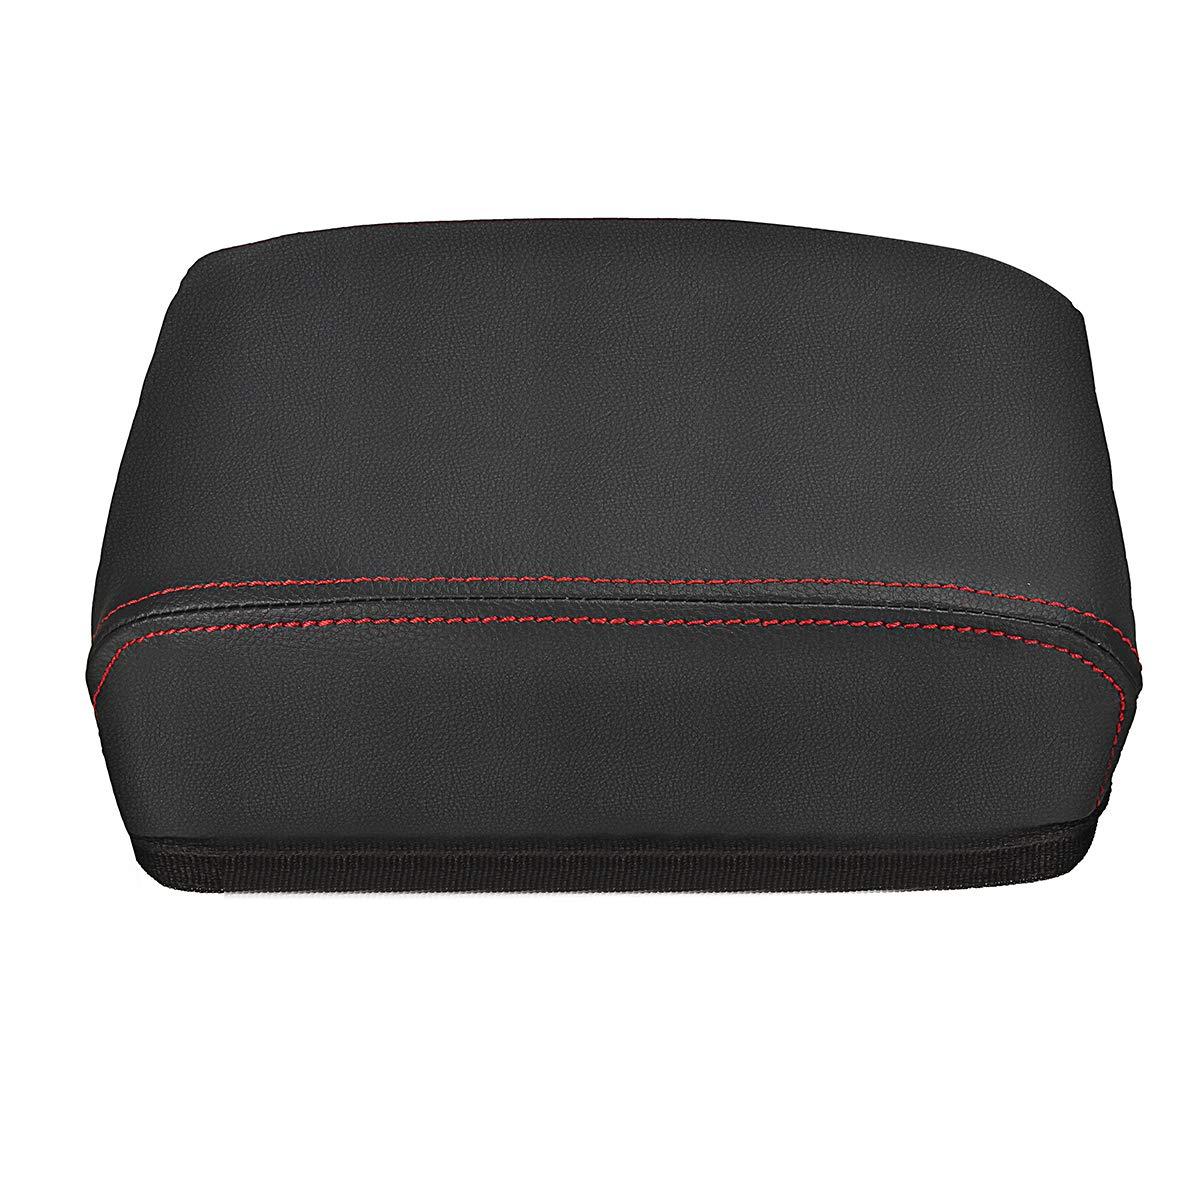 Colorido Borde AAlamor PU Cuero Coche Reposabrazos Asiento Caja Reposabrazos Tapa para VW Tiguan Mk2 2016-2018